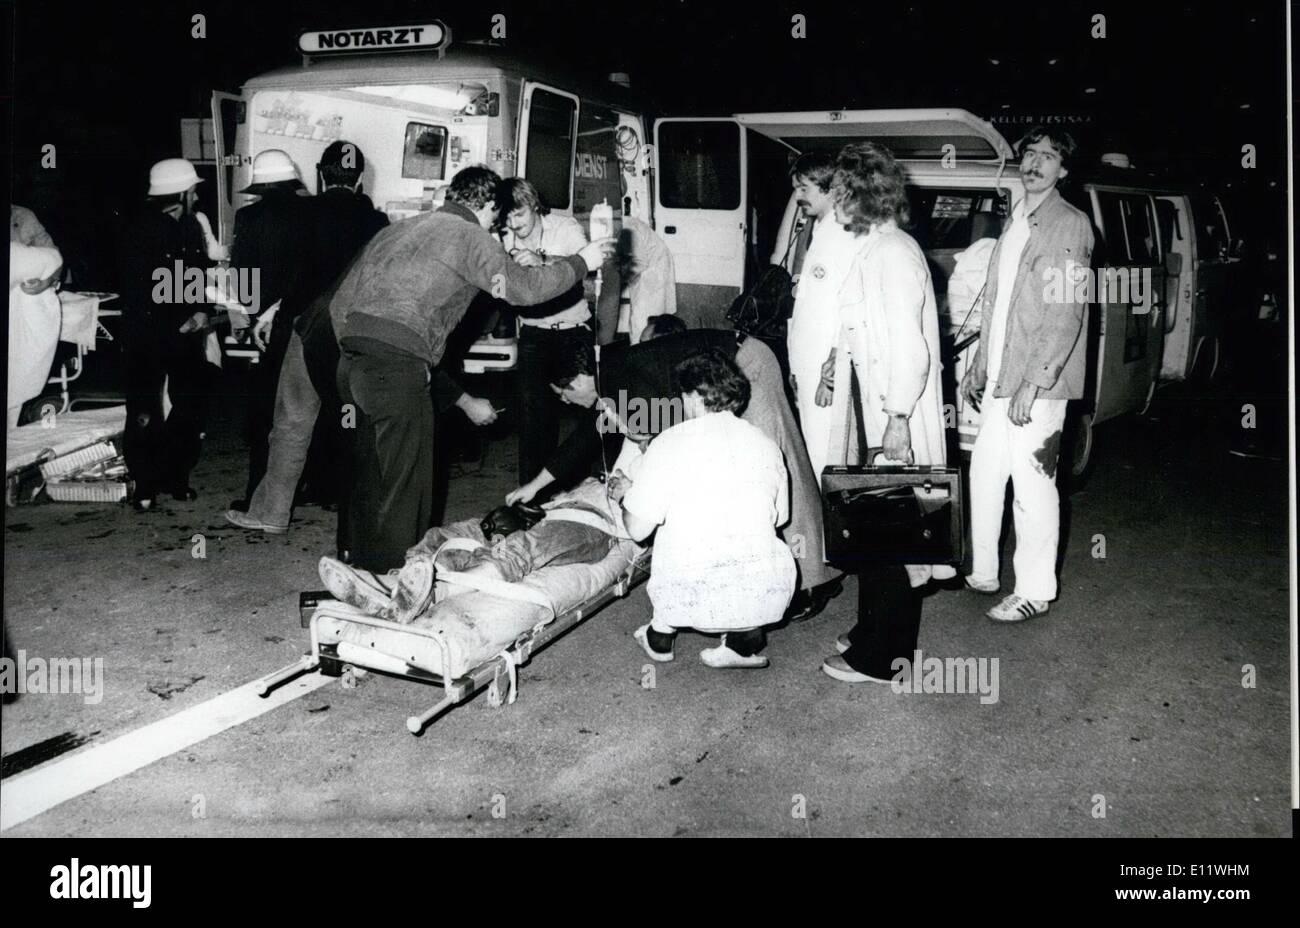 anschlag oktoberfest 1980 opfer